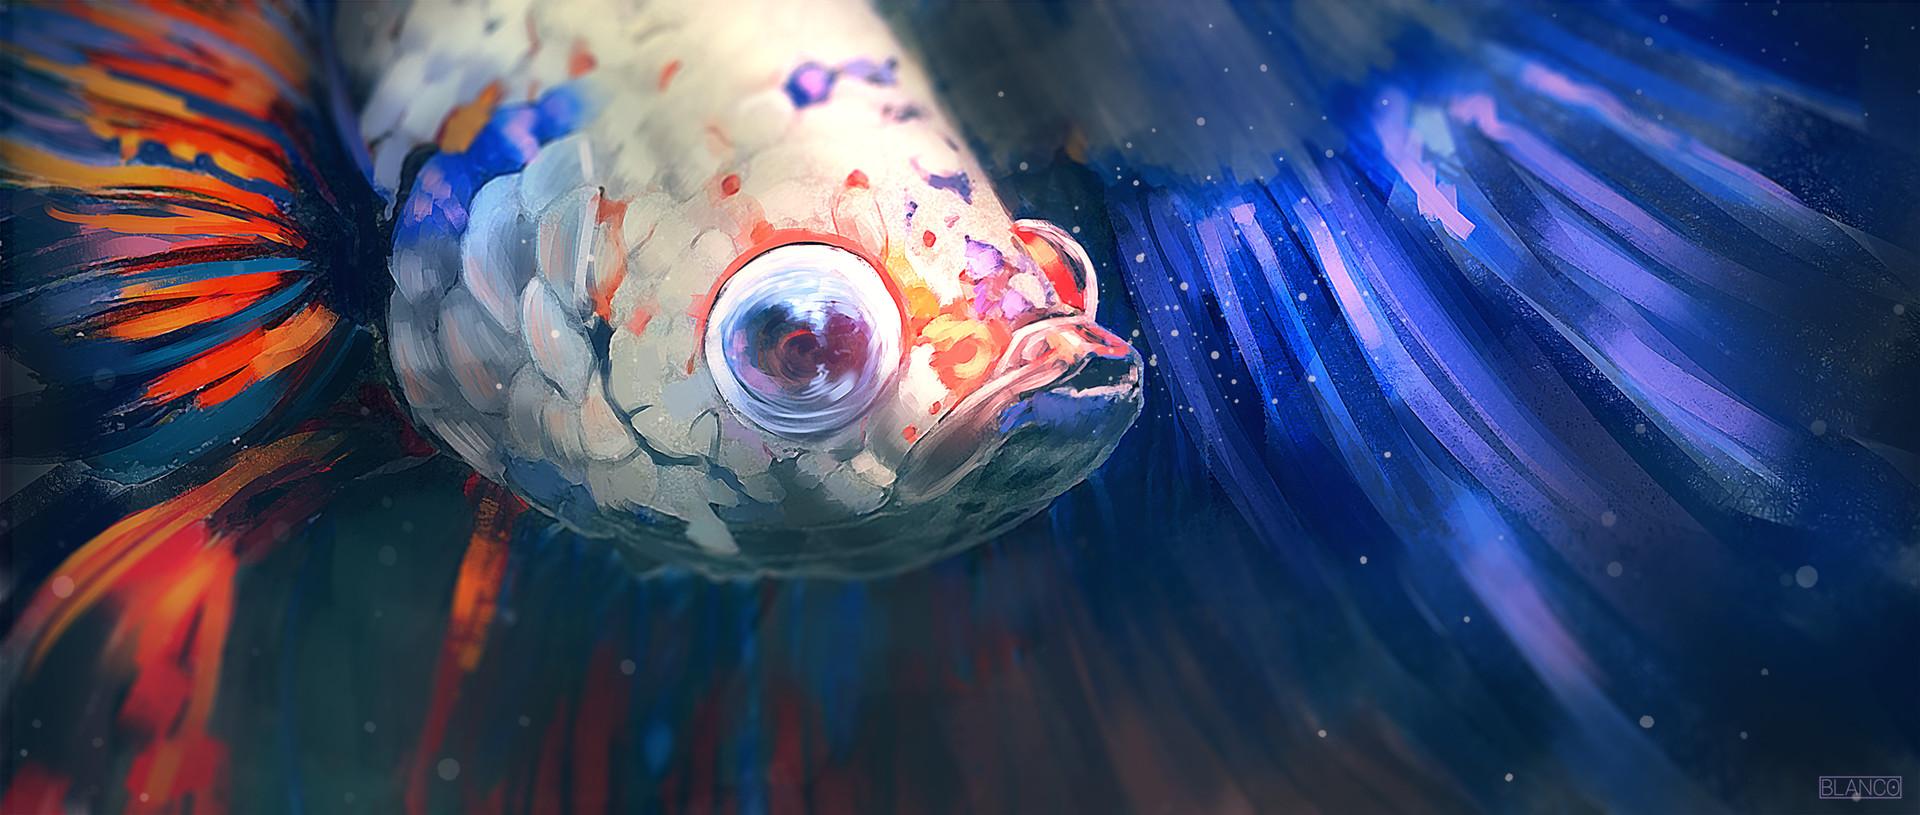 Felipe blanco peixe onirico